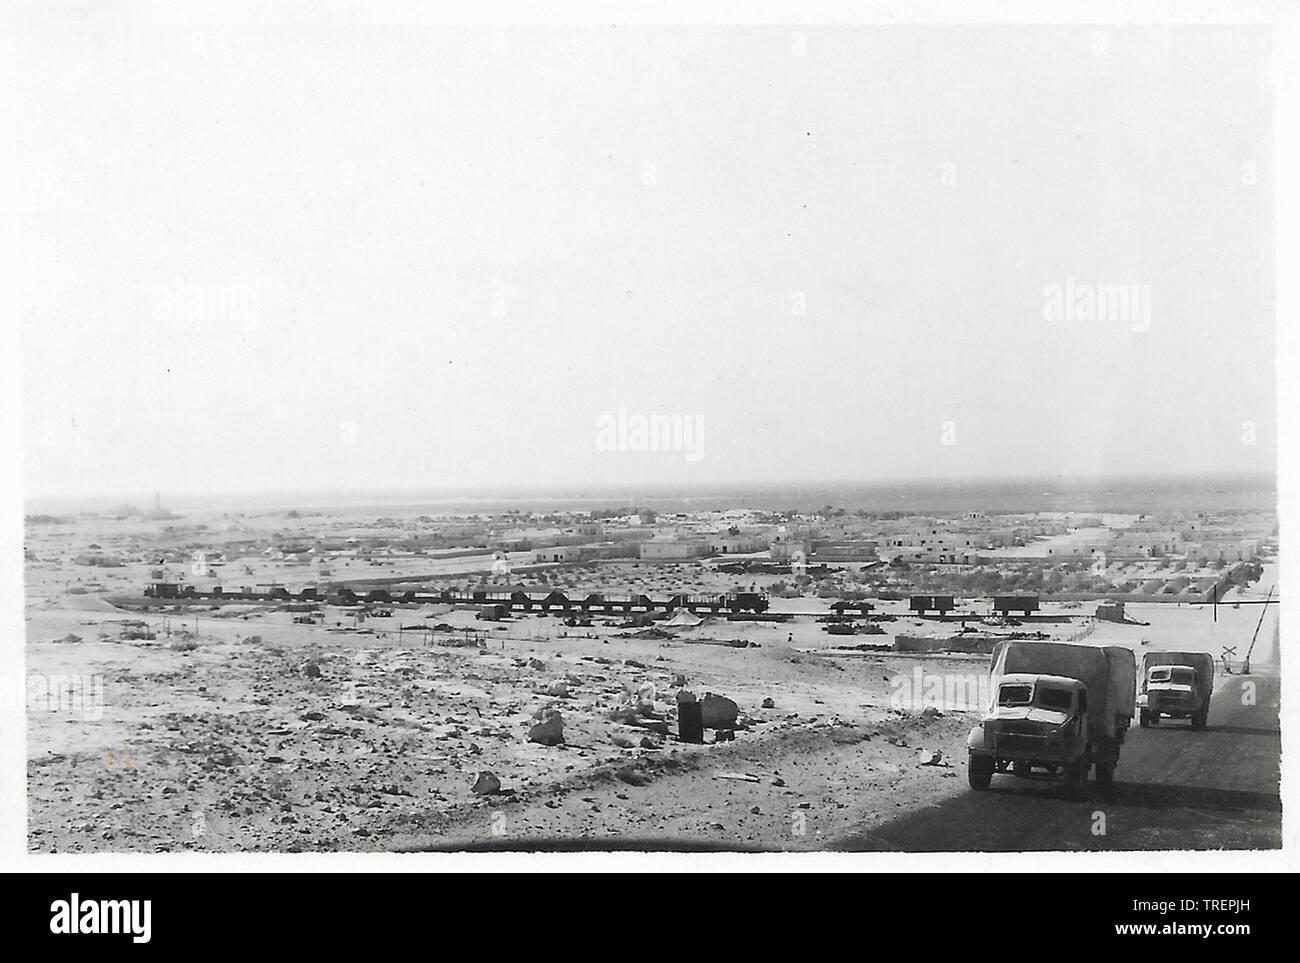 Convoi Derna Libye prises en 1943/44 par Flt Sgt Gleed RAF WW2, de l'Escadron 223 Photo Stock